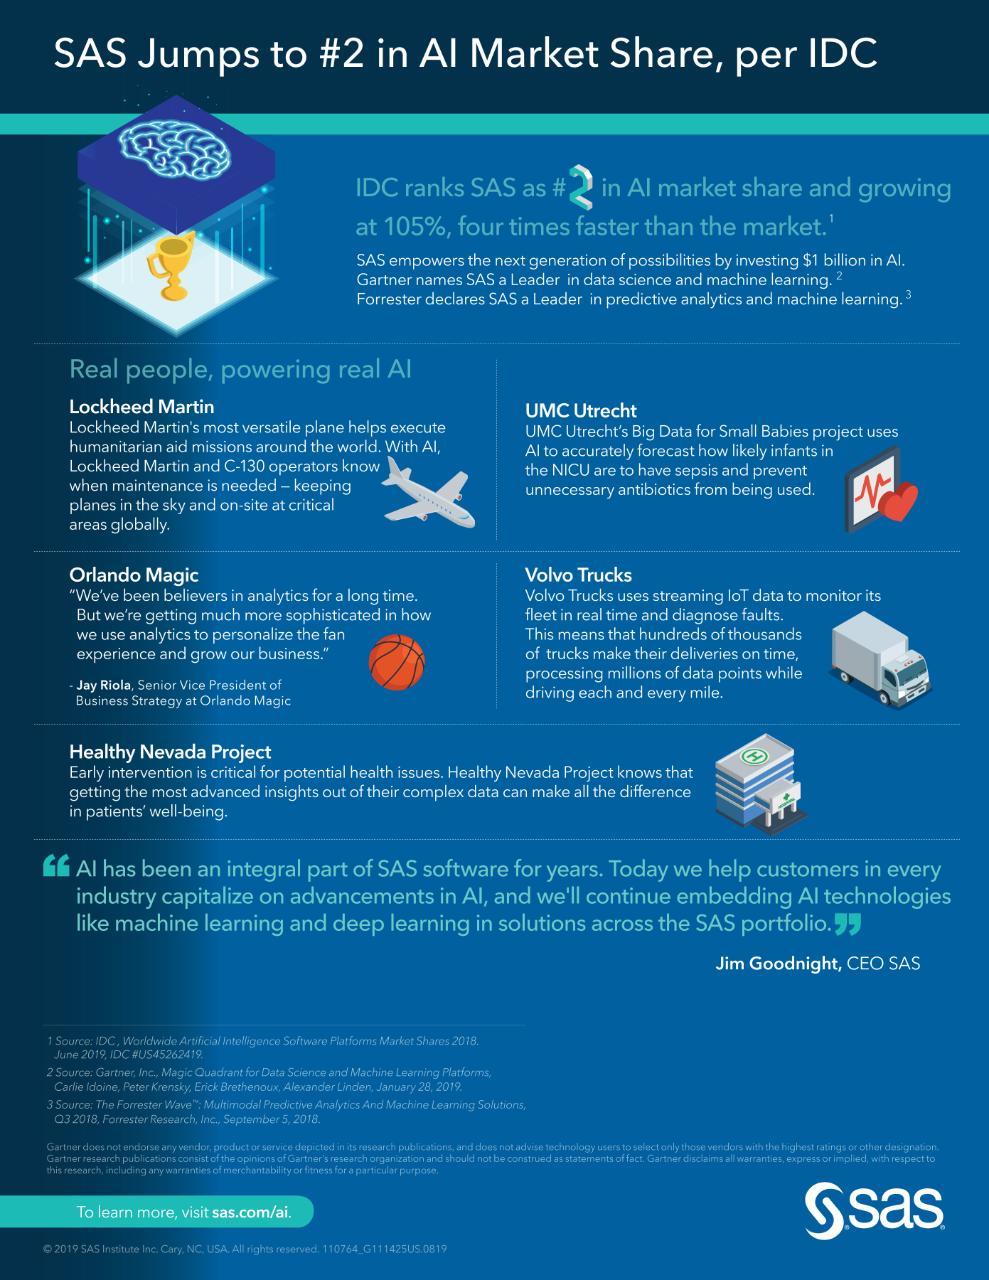 ai market share infographic